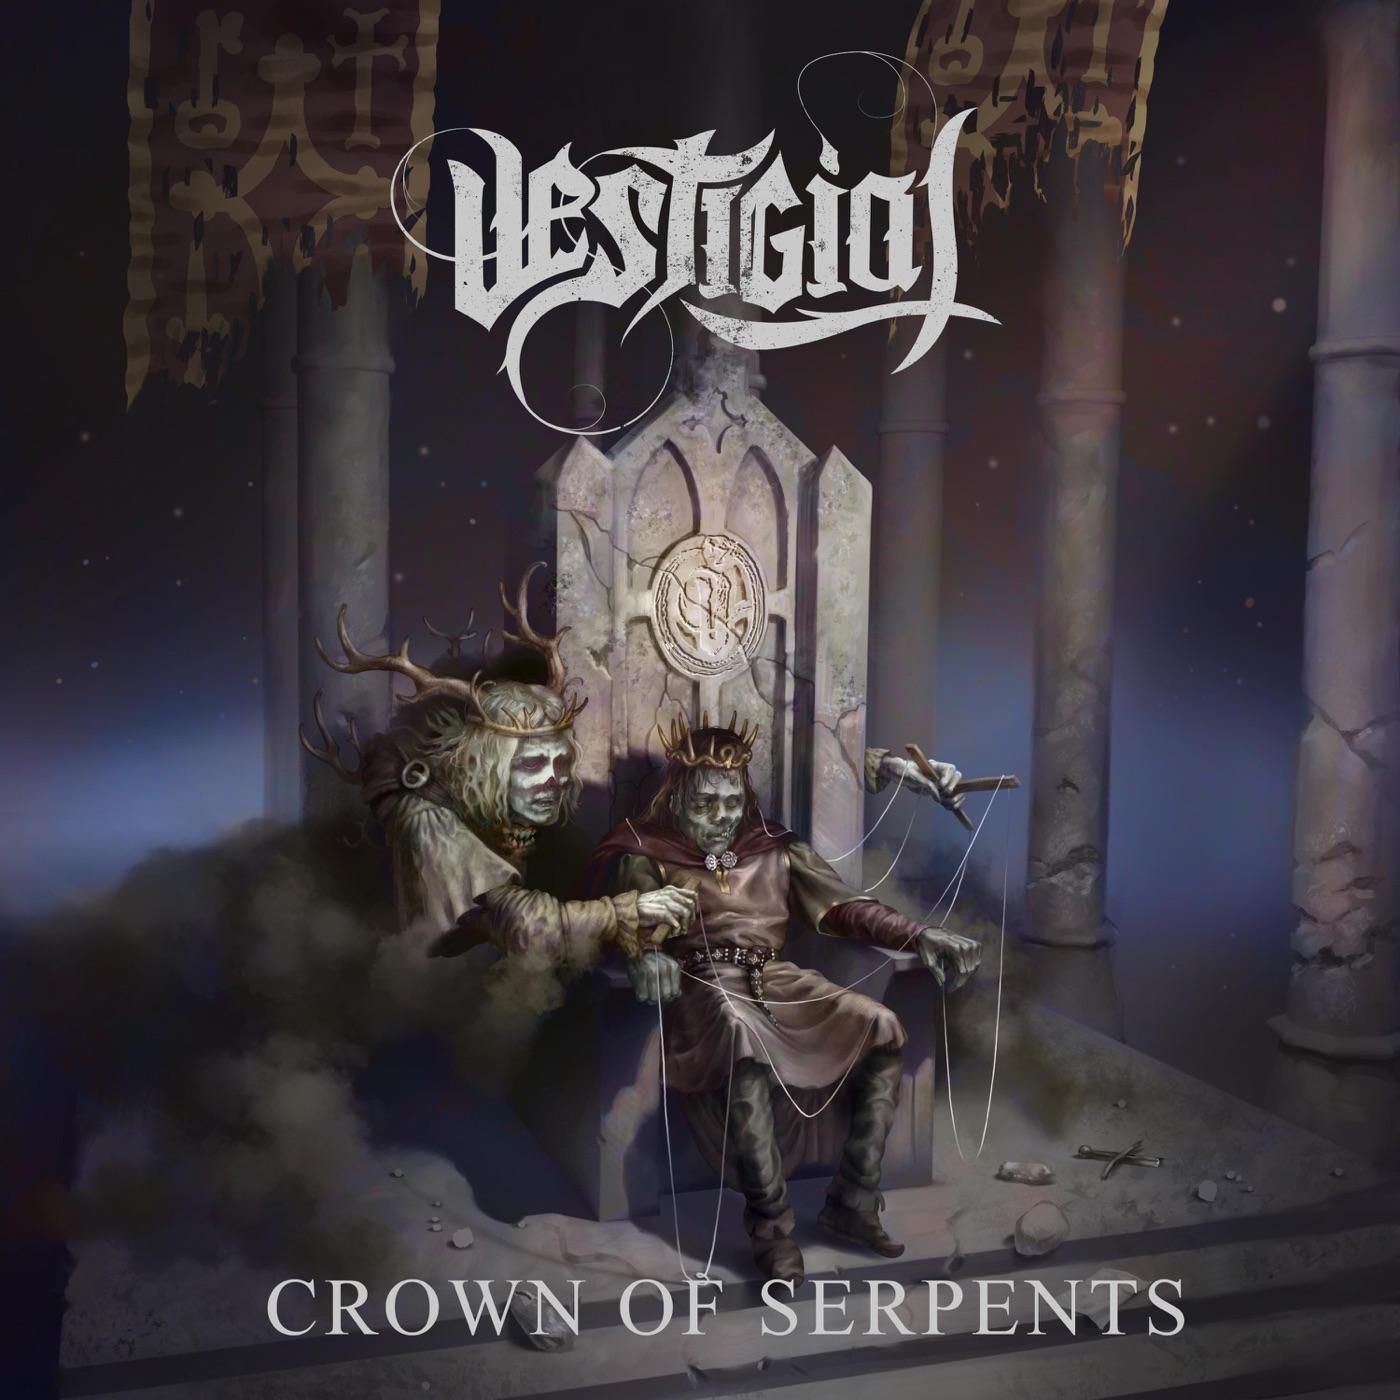 Vestigial - Crown of Serpents (2019)